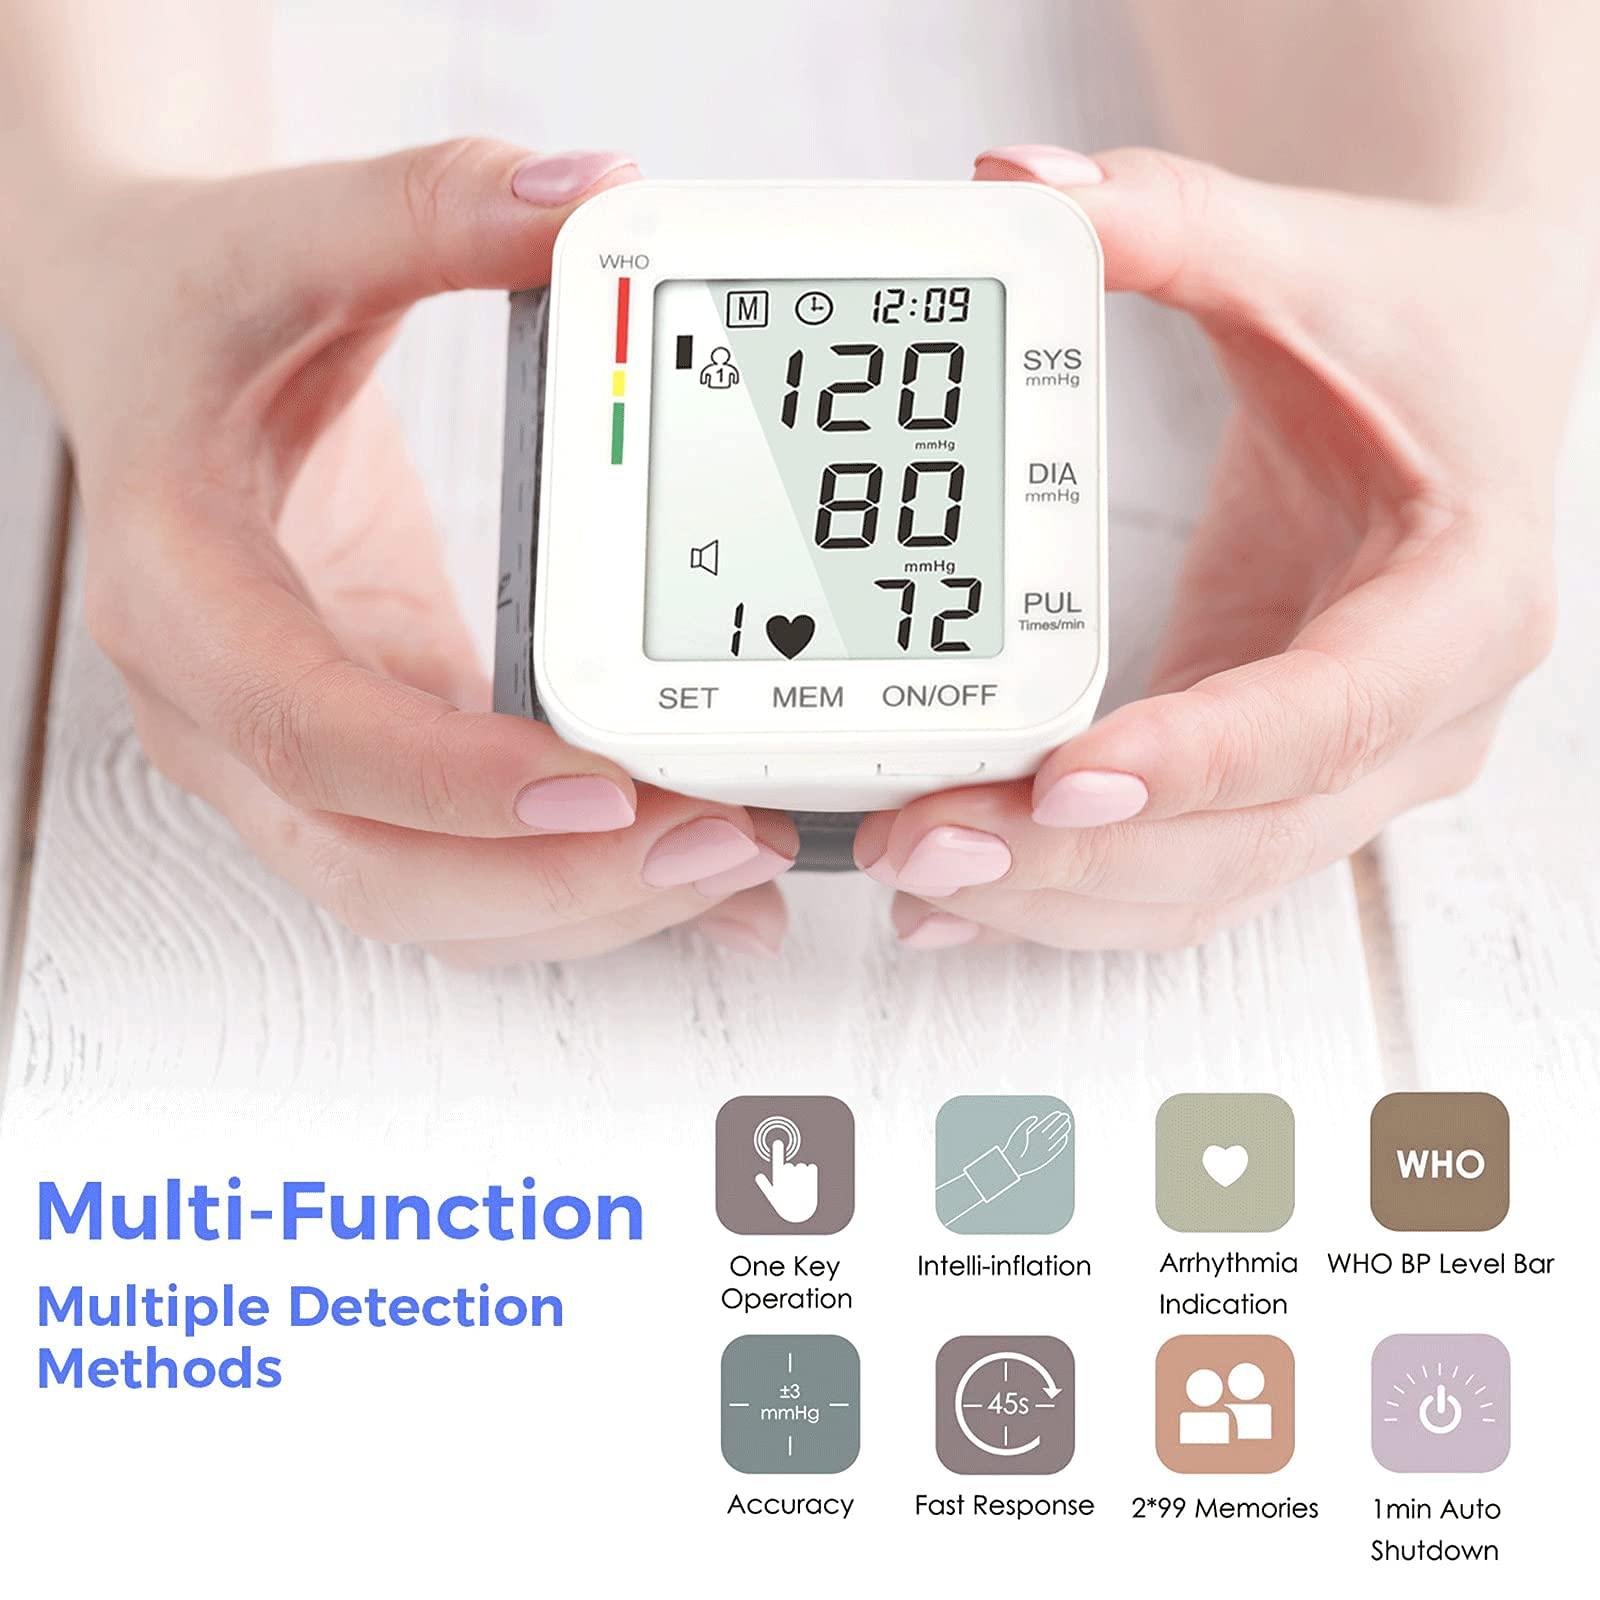 Blood Pressure Monitor LCD Display Adjustable Wrist Cuff Blood Pressure Monitors Ober Health 7